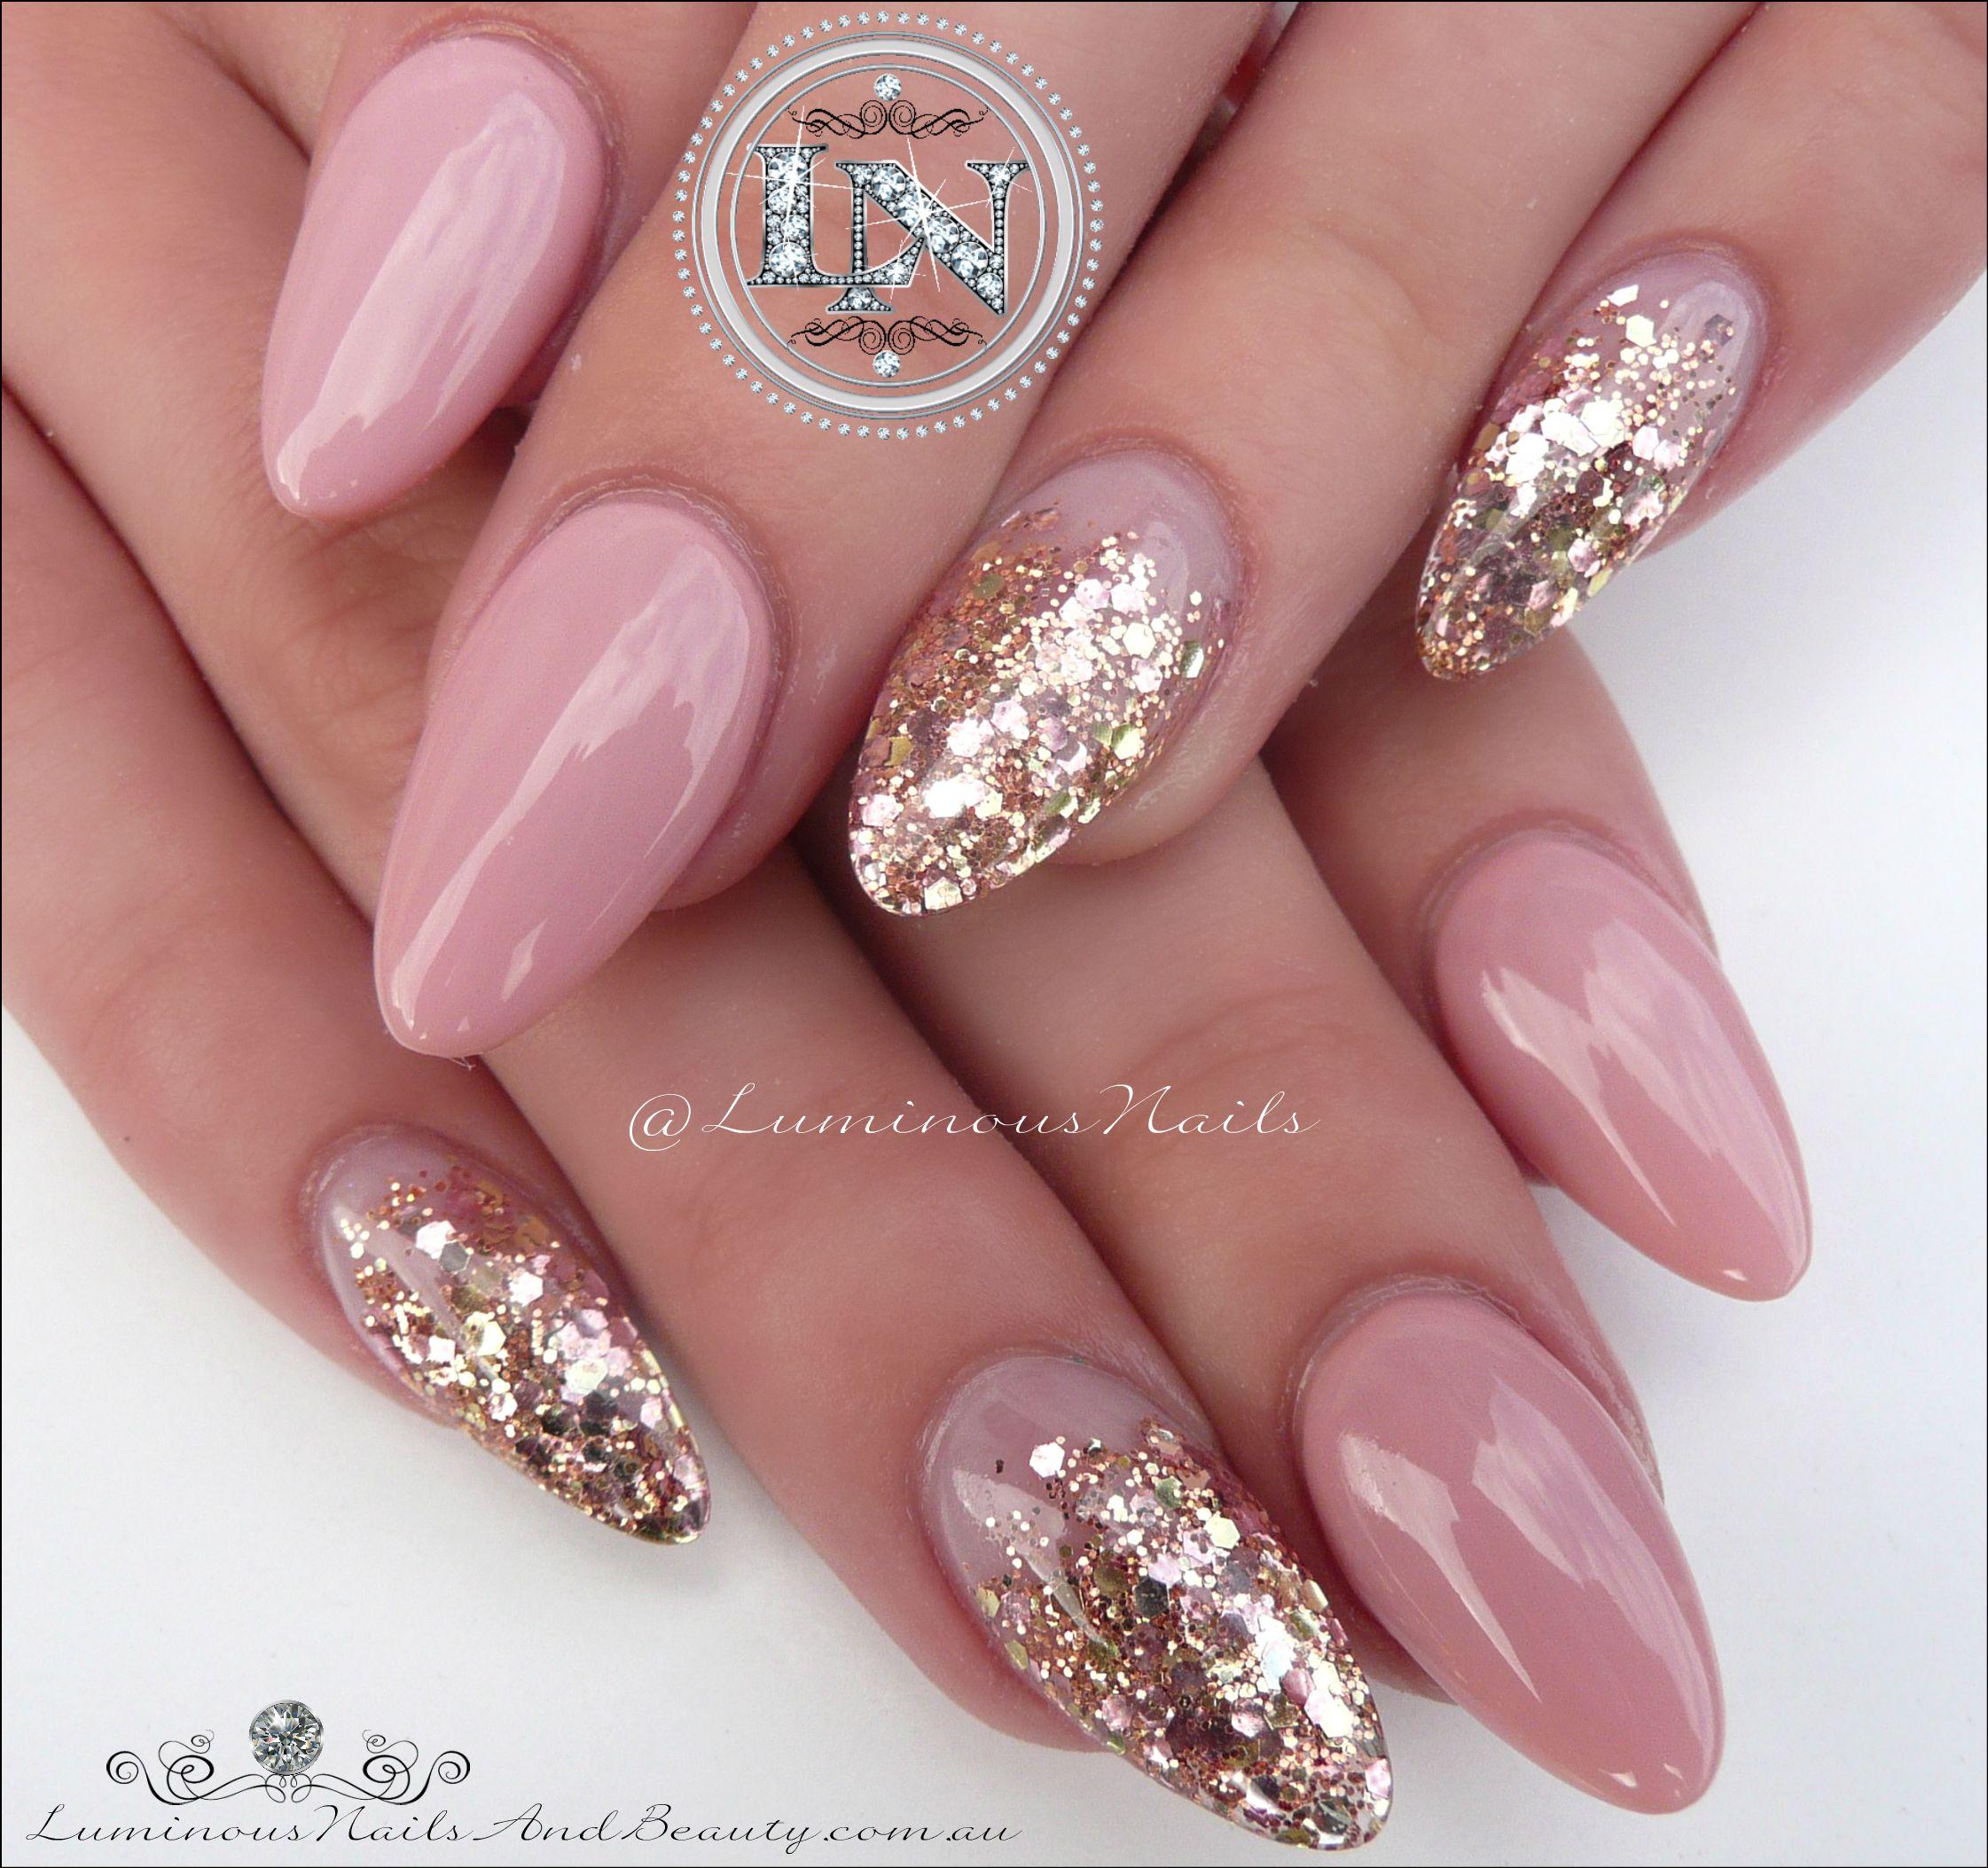 Pin On Luminous Nails